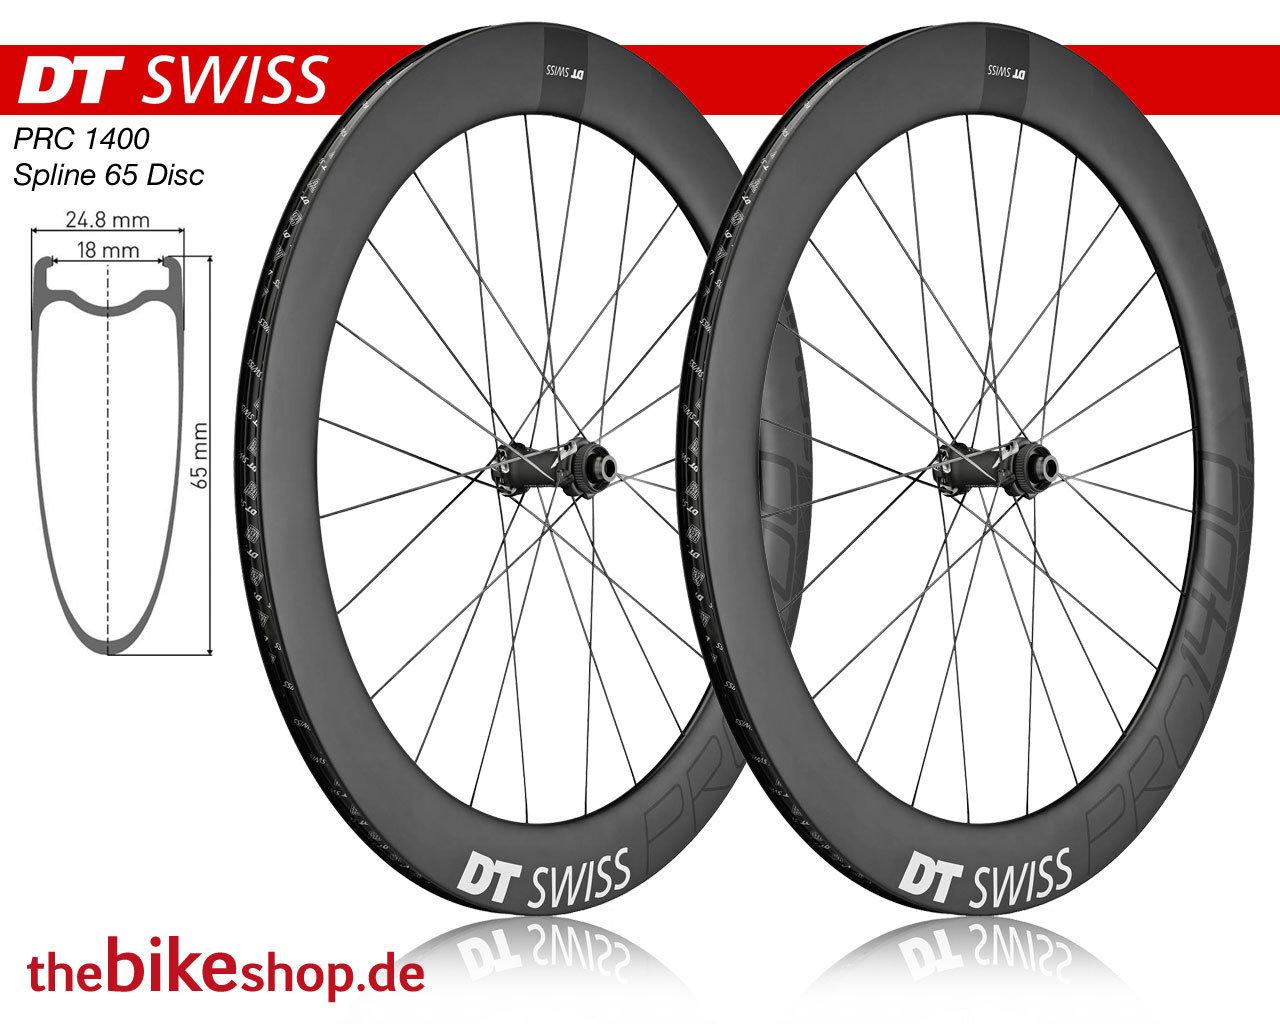 1280x1024 Dt Swiss Prc 1400 Spline Disc 65 Wheel Set